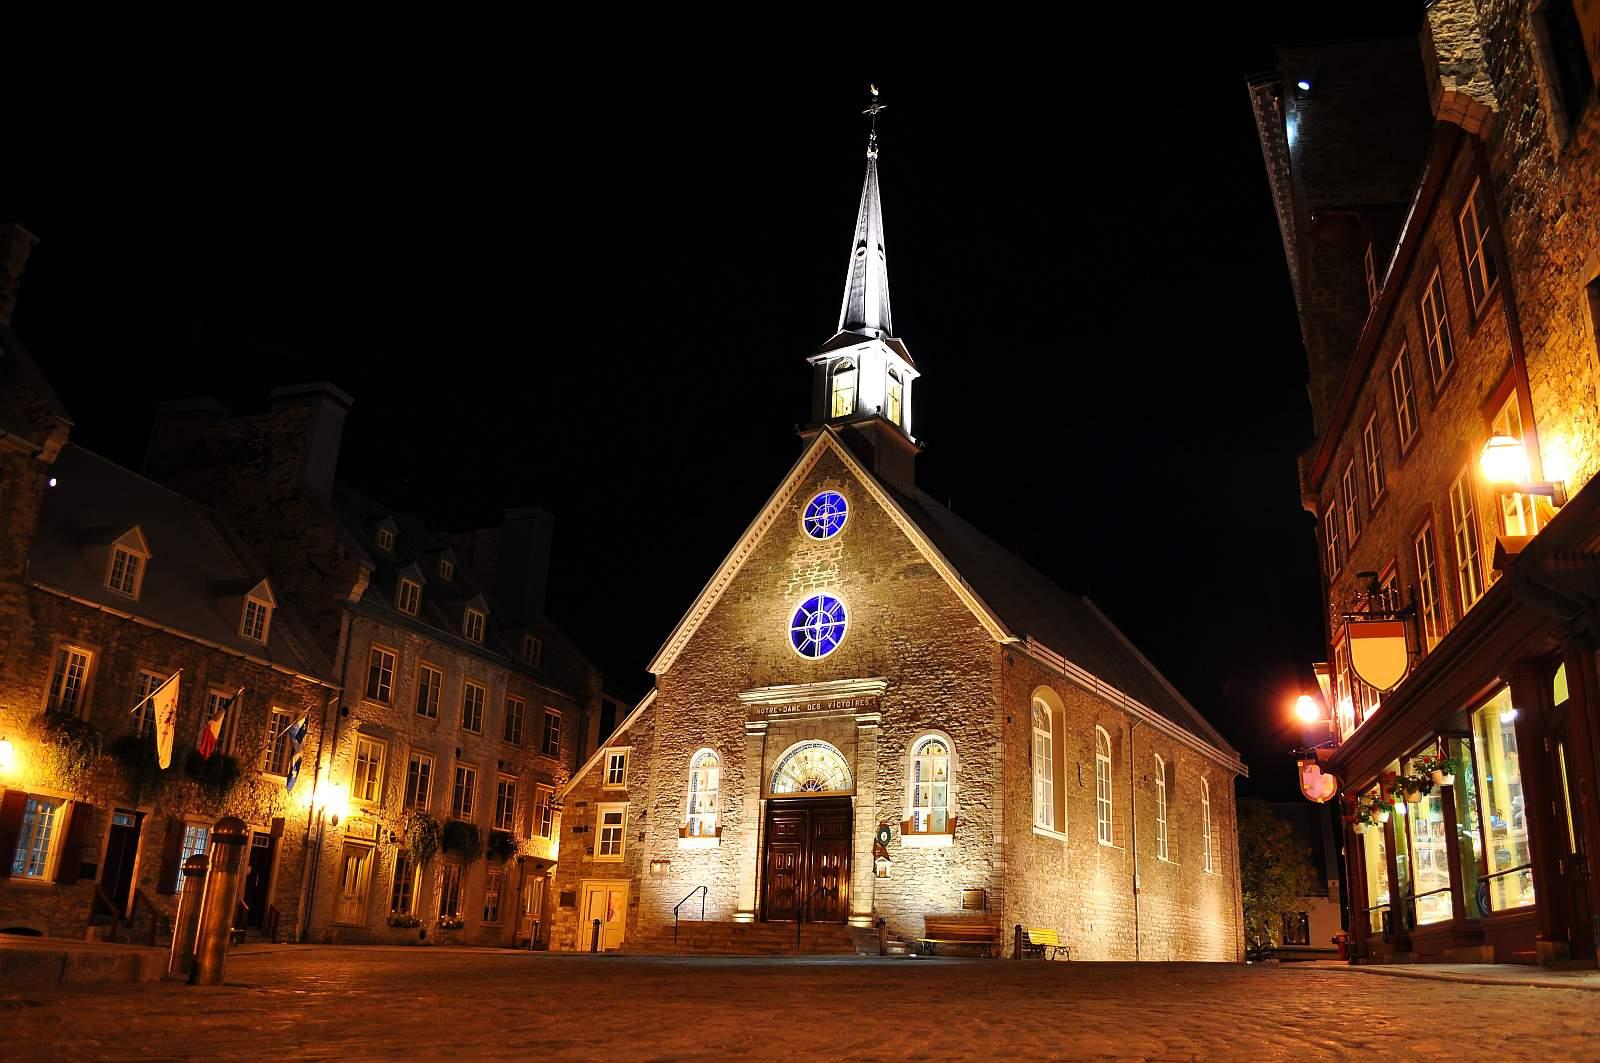 Blick auf die historische Altstadt Quebecs, Vieux-Québec.